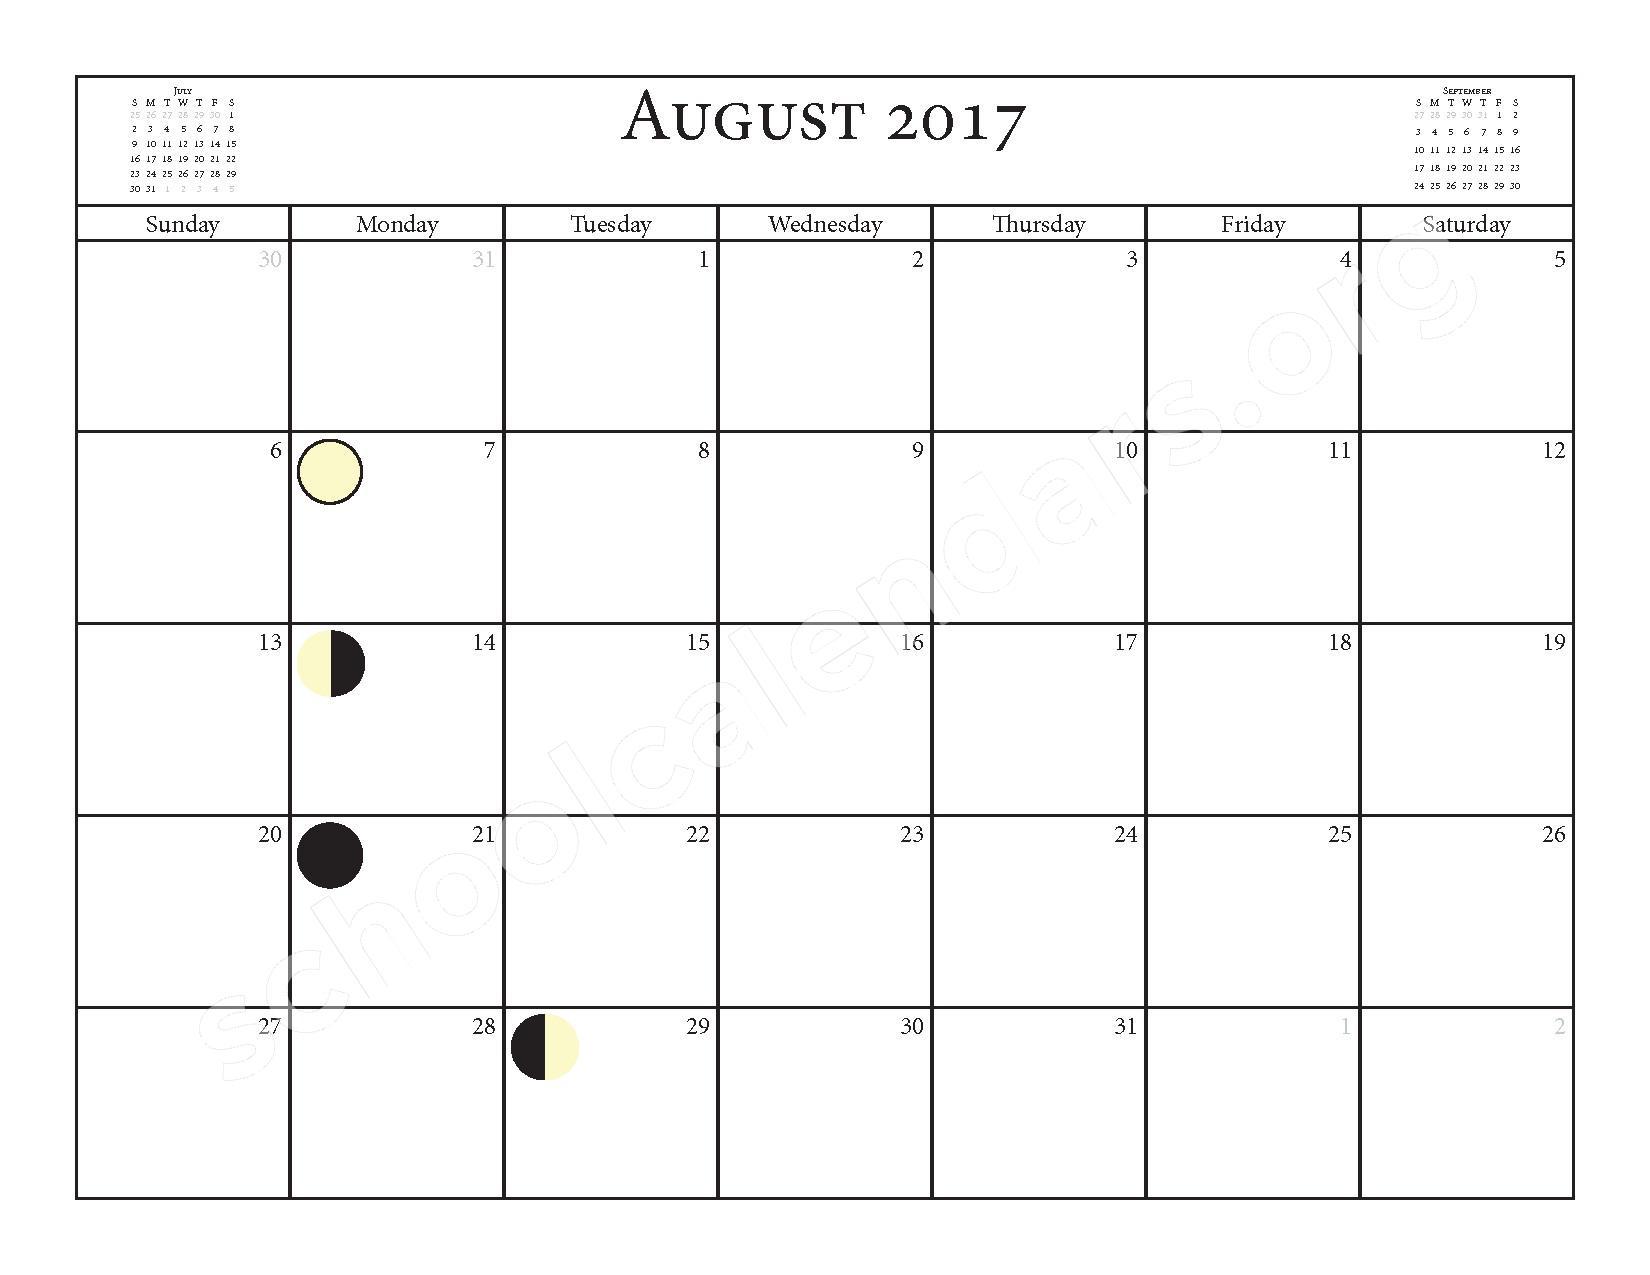 2016 - 2017 School Calendar – Salmon River Central School District – page 25